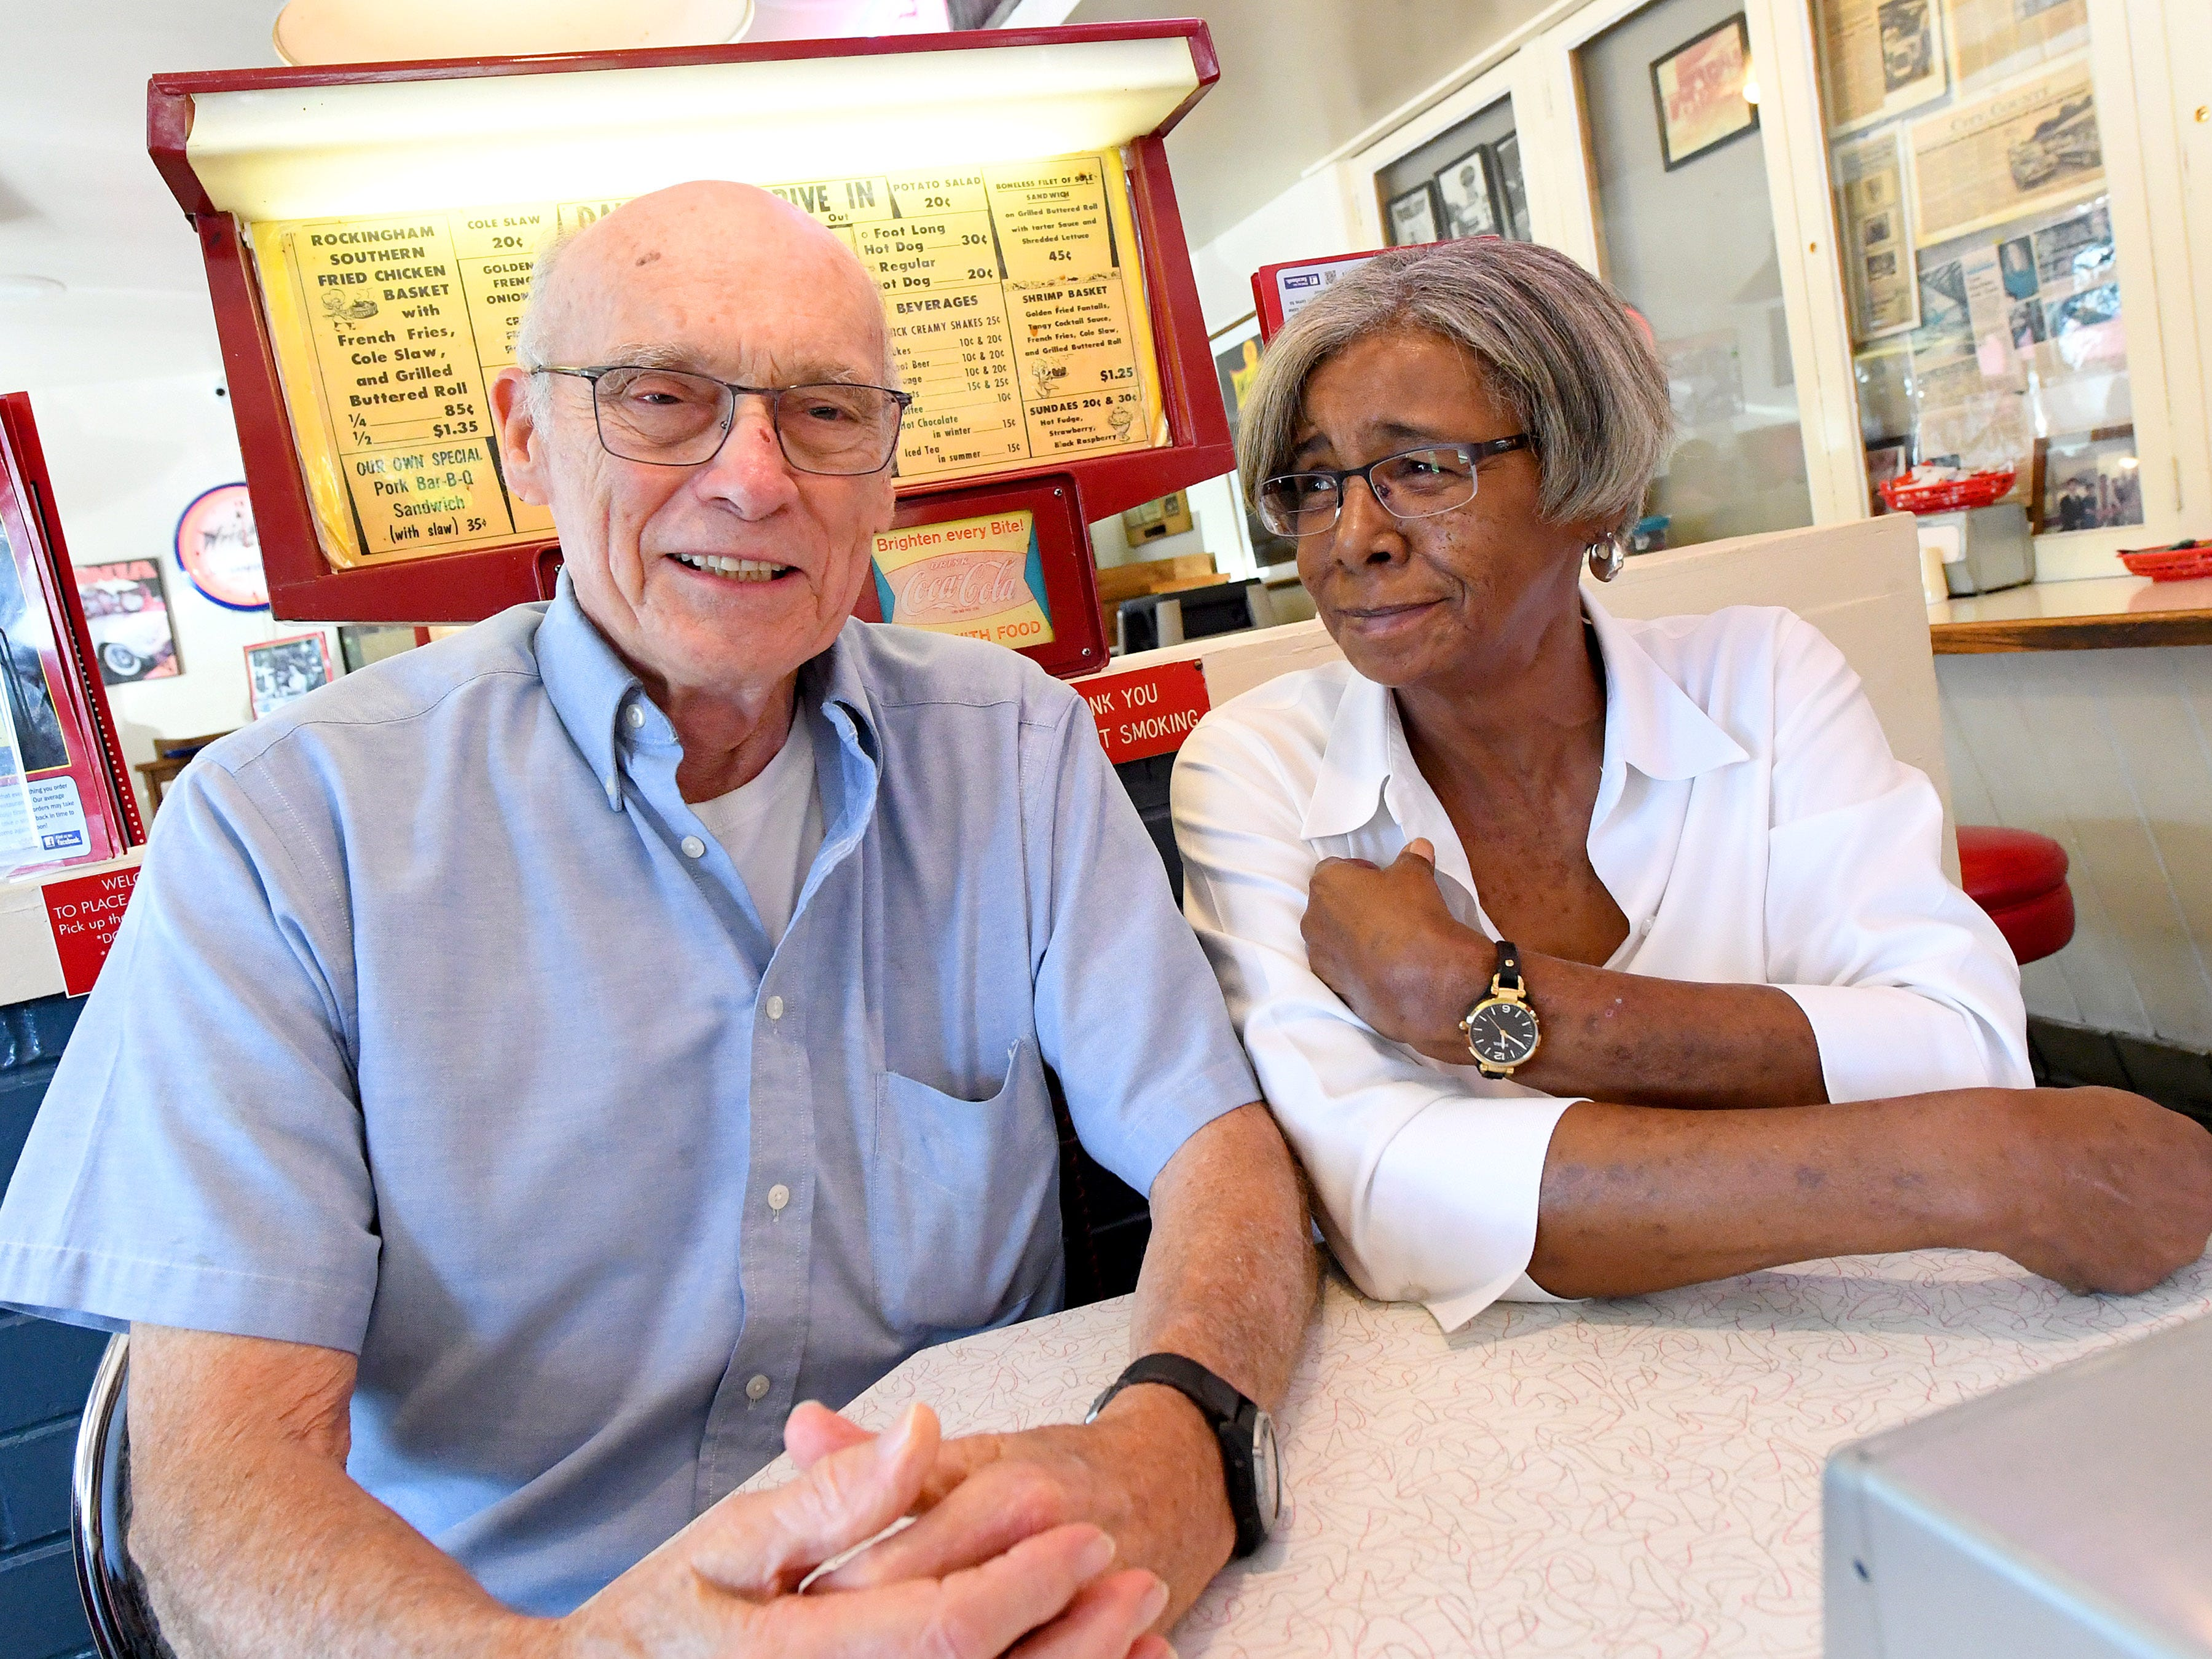 Desegregation began in Staunton at Wright's Dairy-Rite